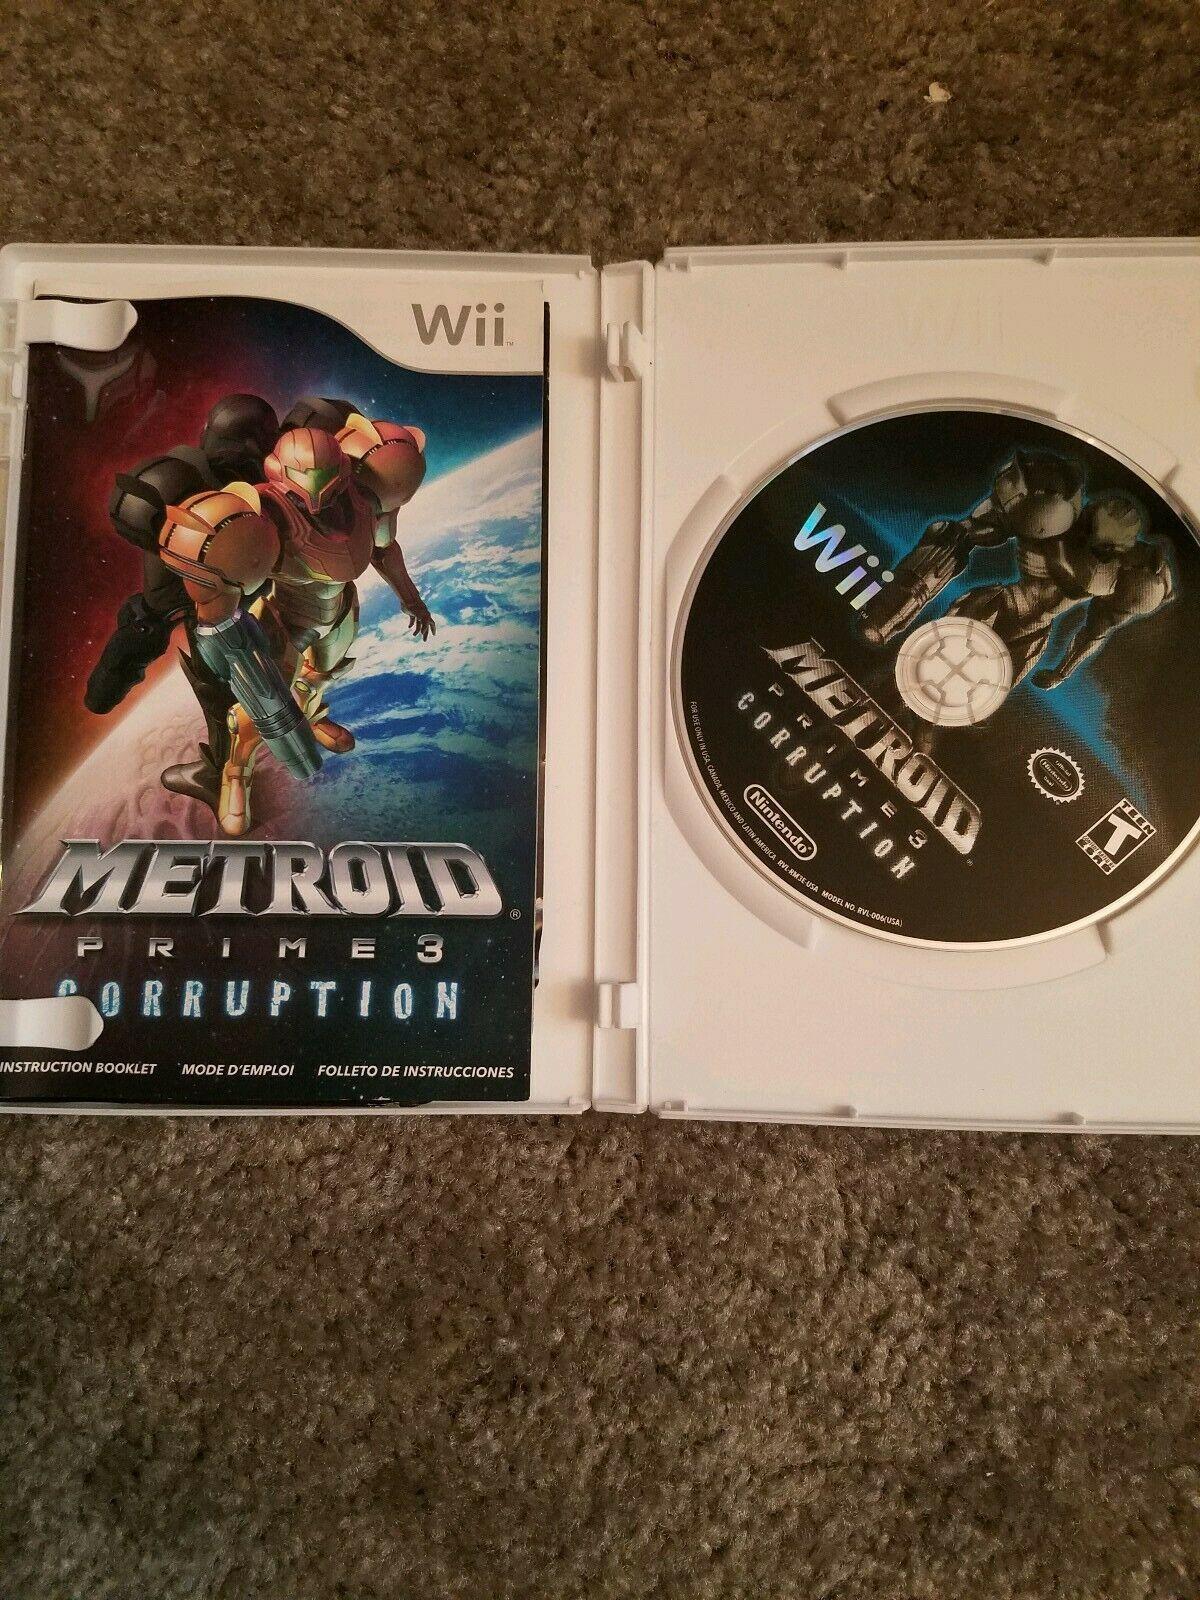 Metroid Prime 3: Corruption (Nintendo Wii, 2007) image 2